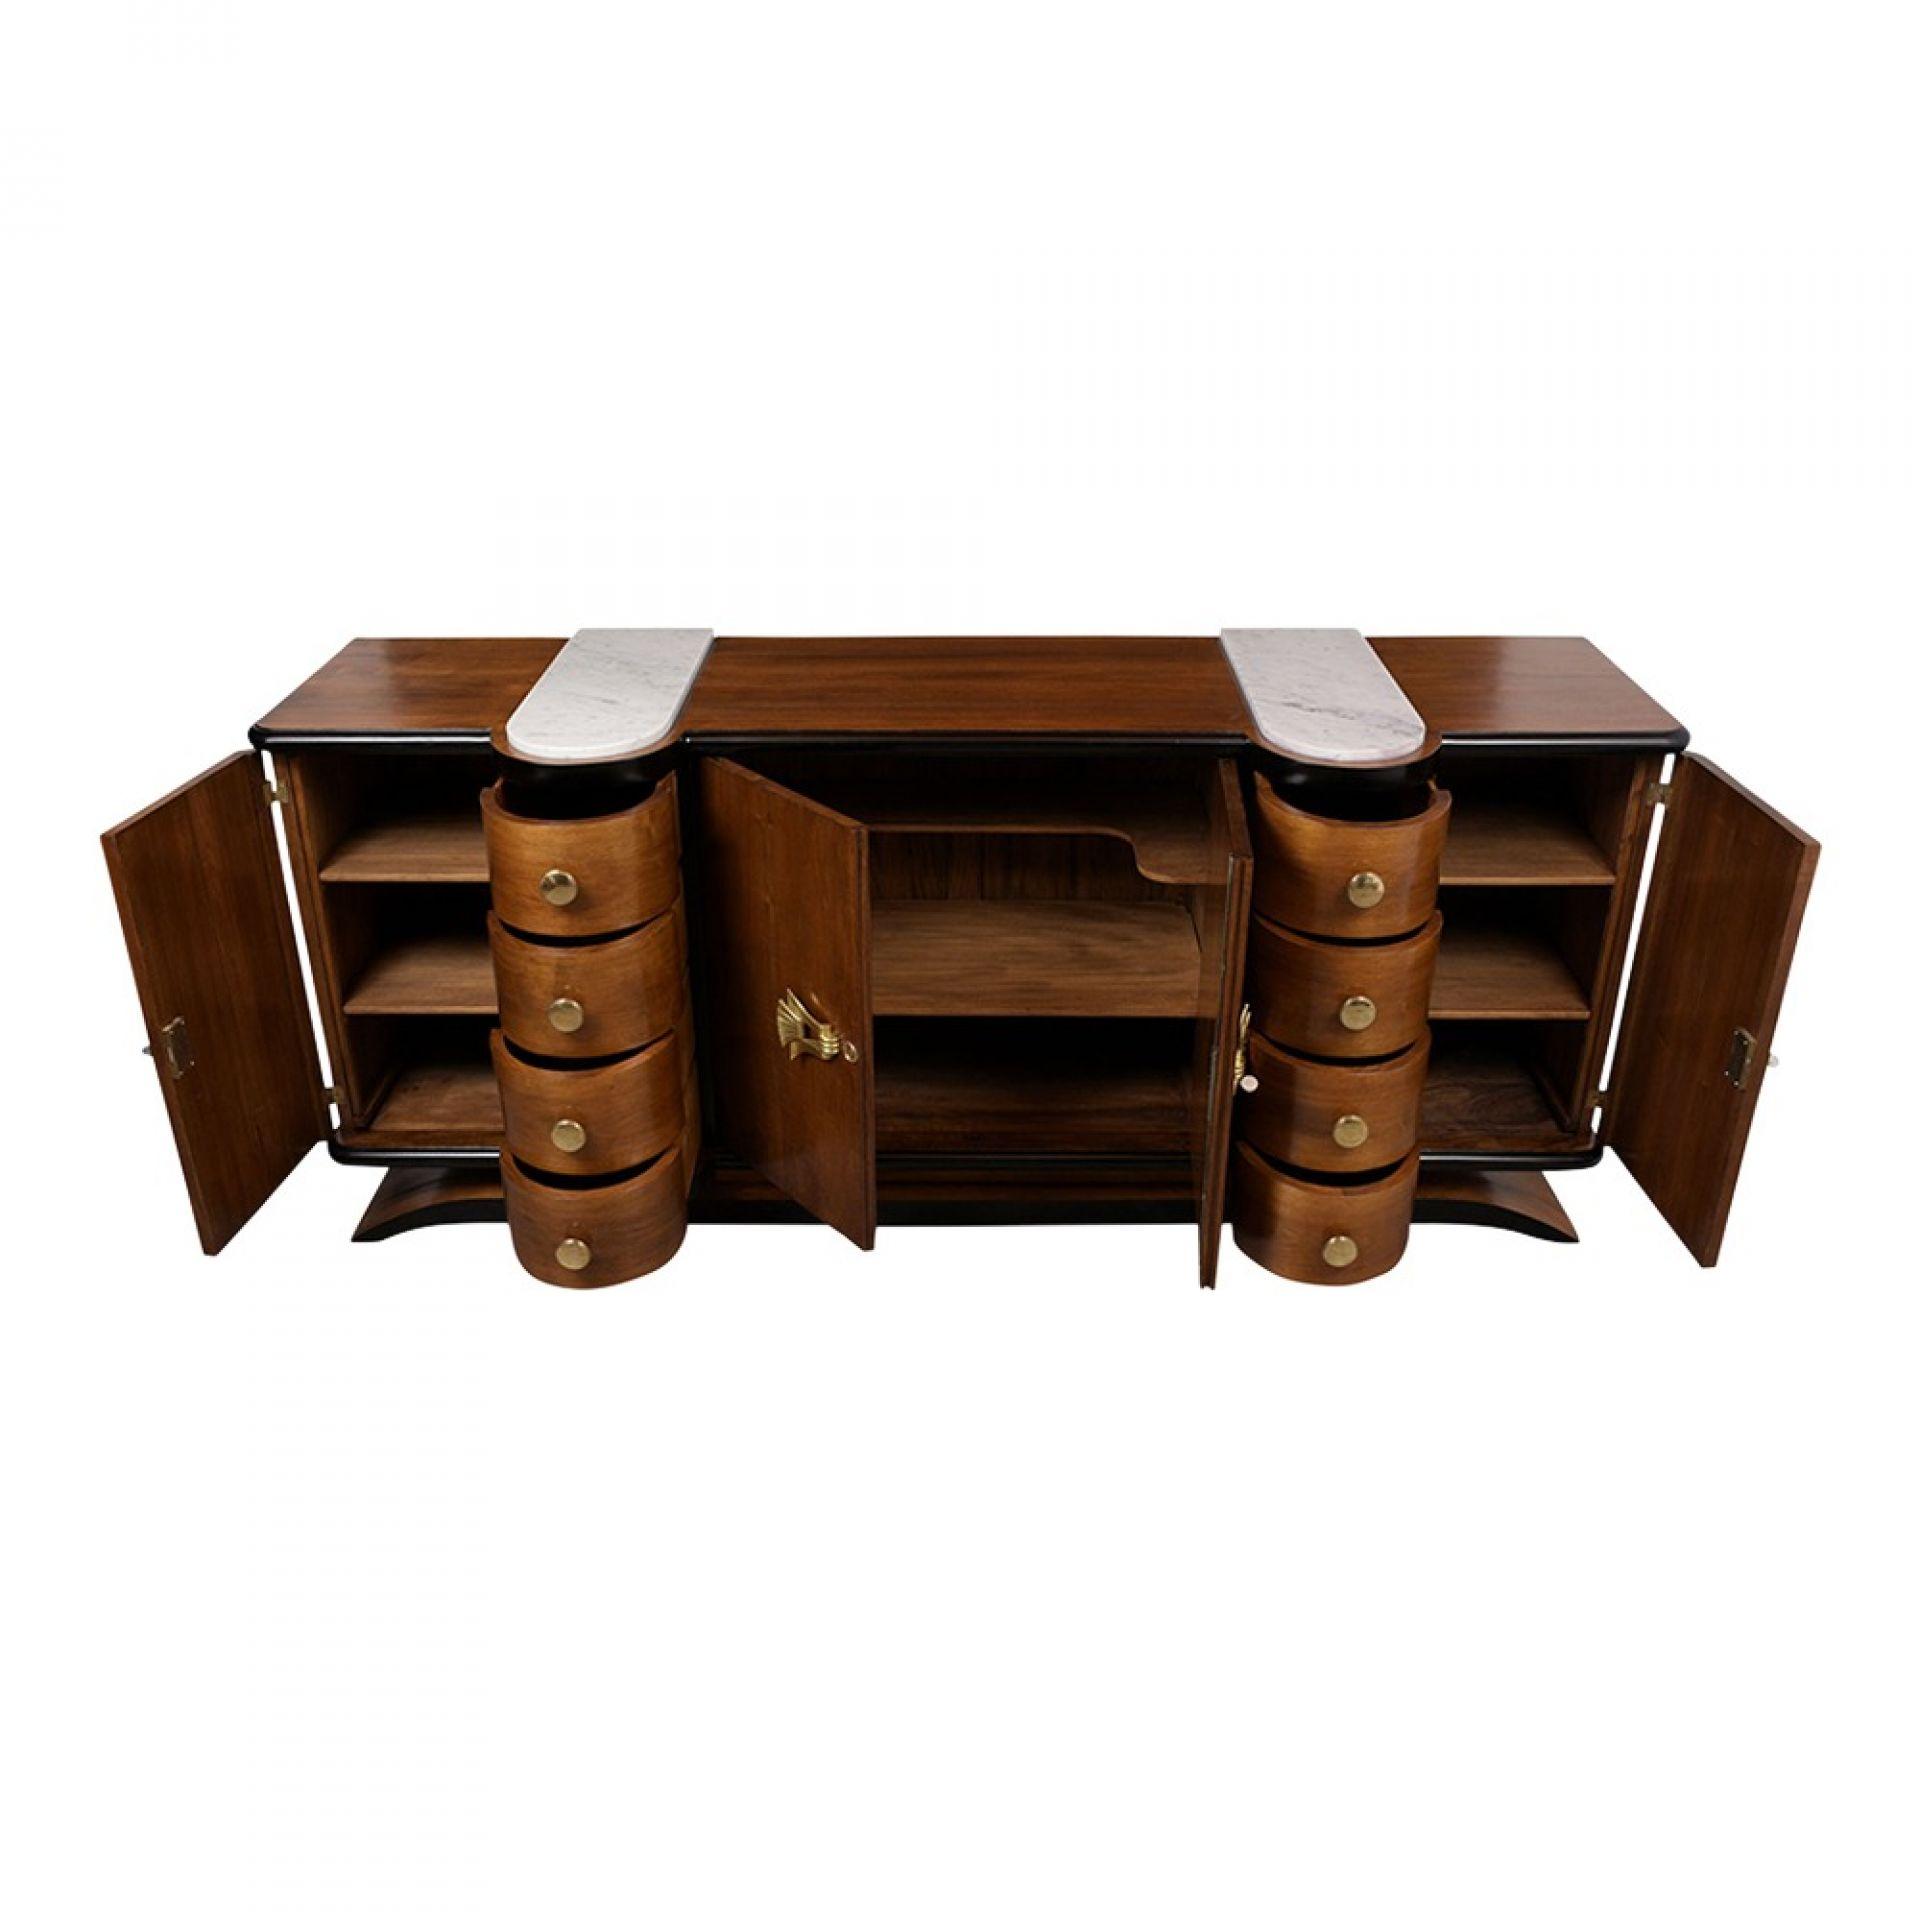 Modern French Art Deco Style Buffet